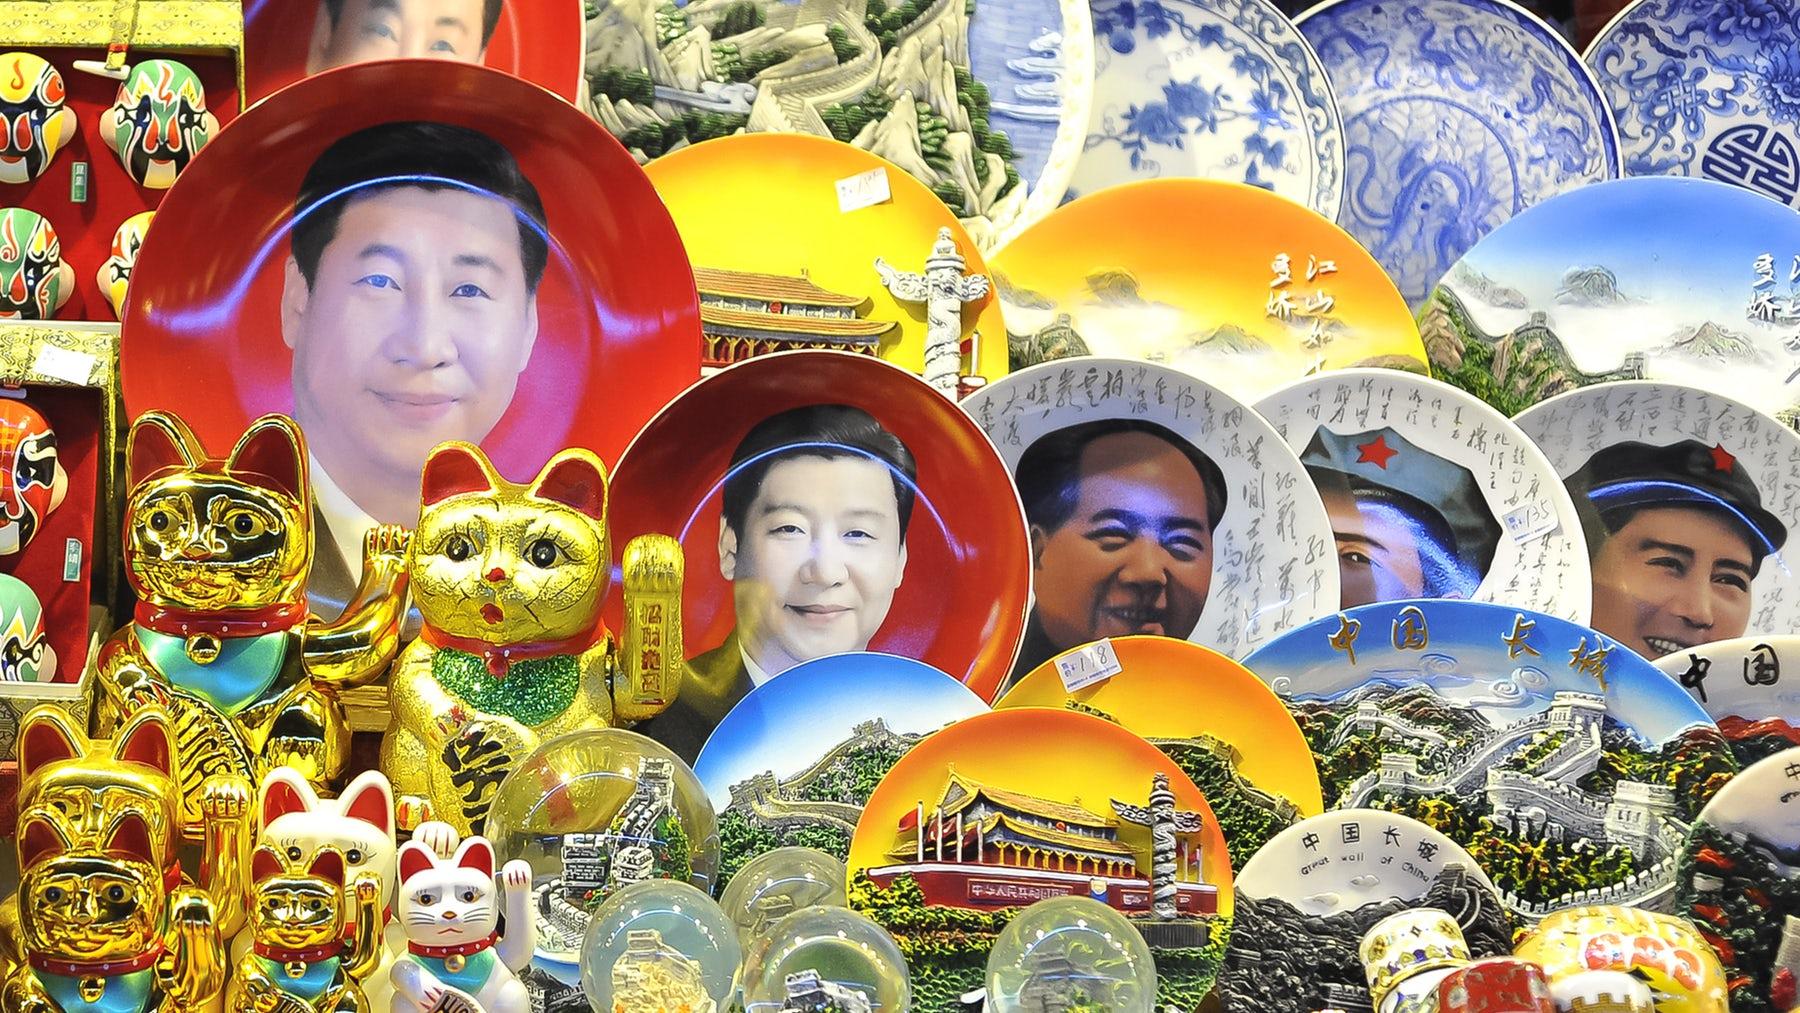 A souvenir stall at a Beijing night market selling Xi Jinping memorabilia |  Source: Shutterstock